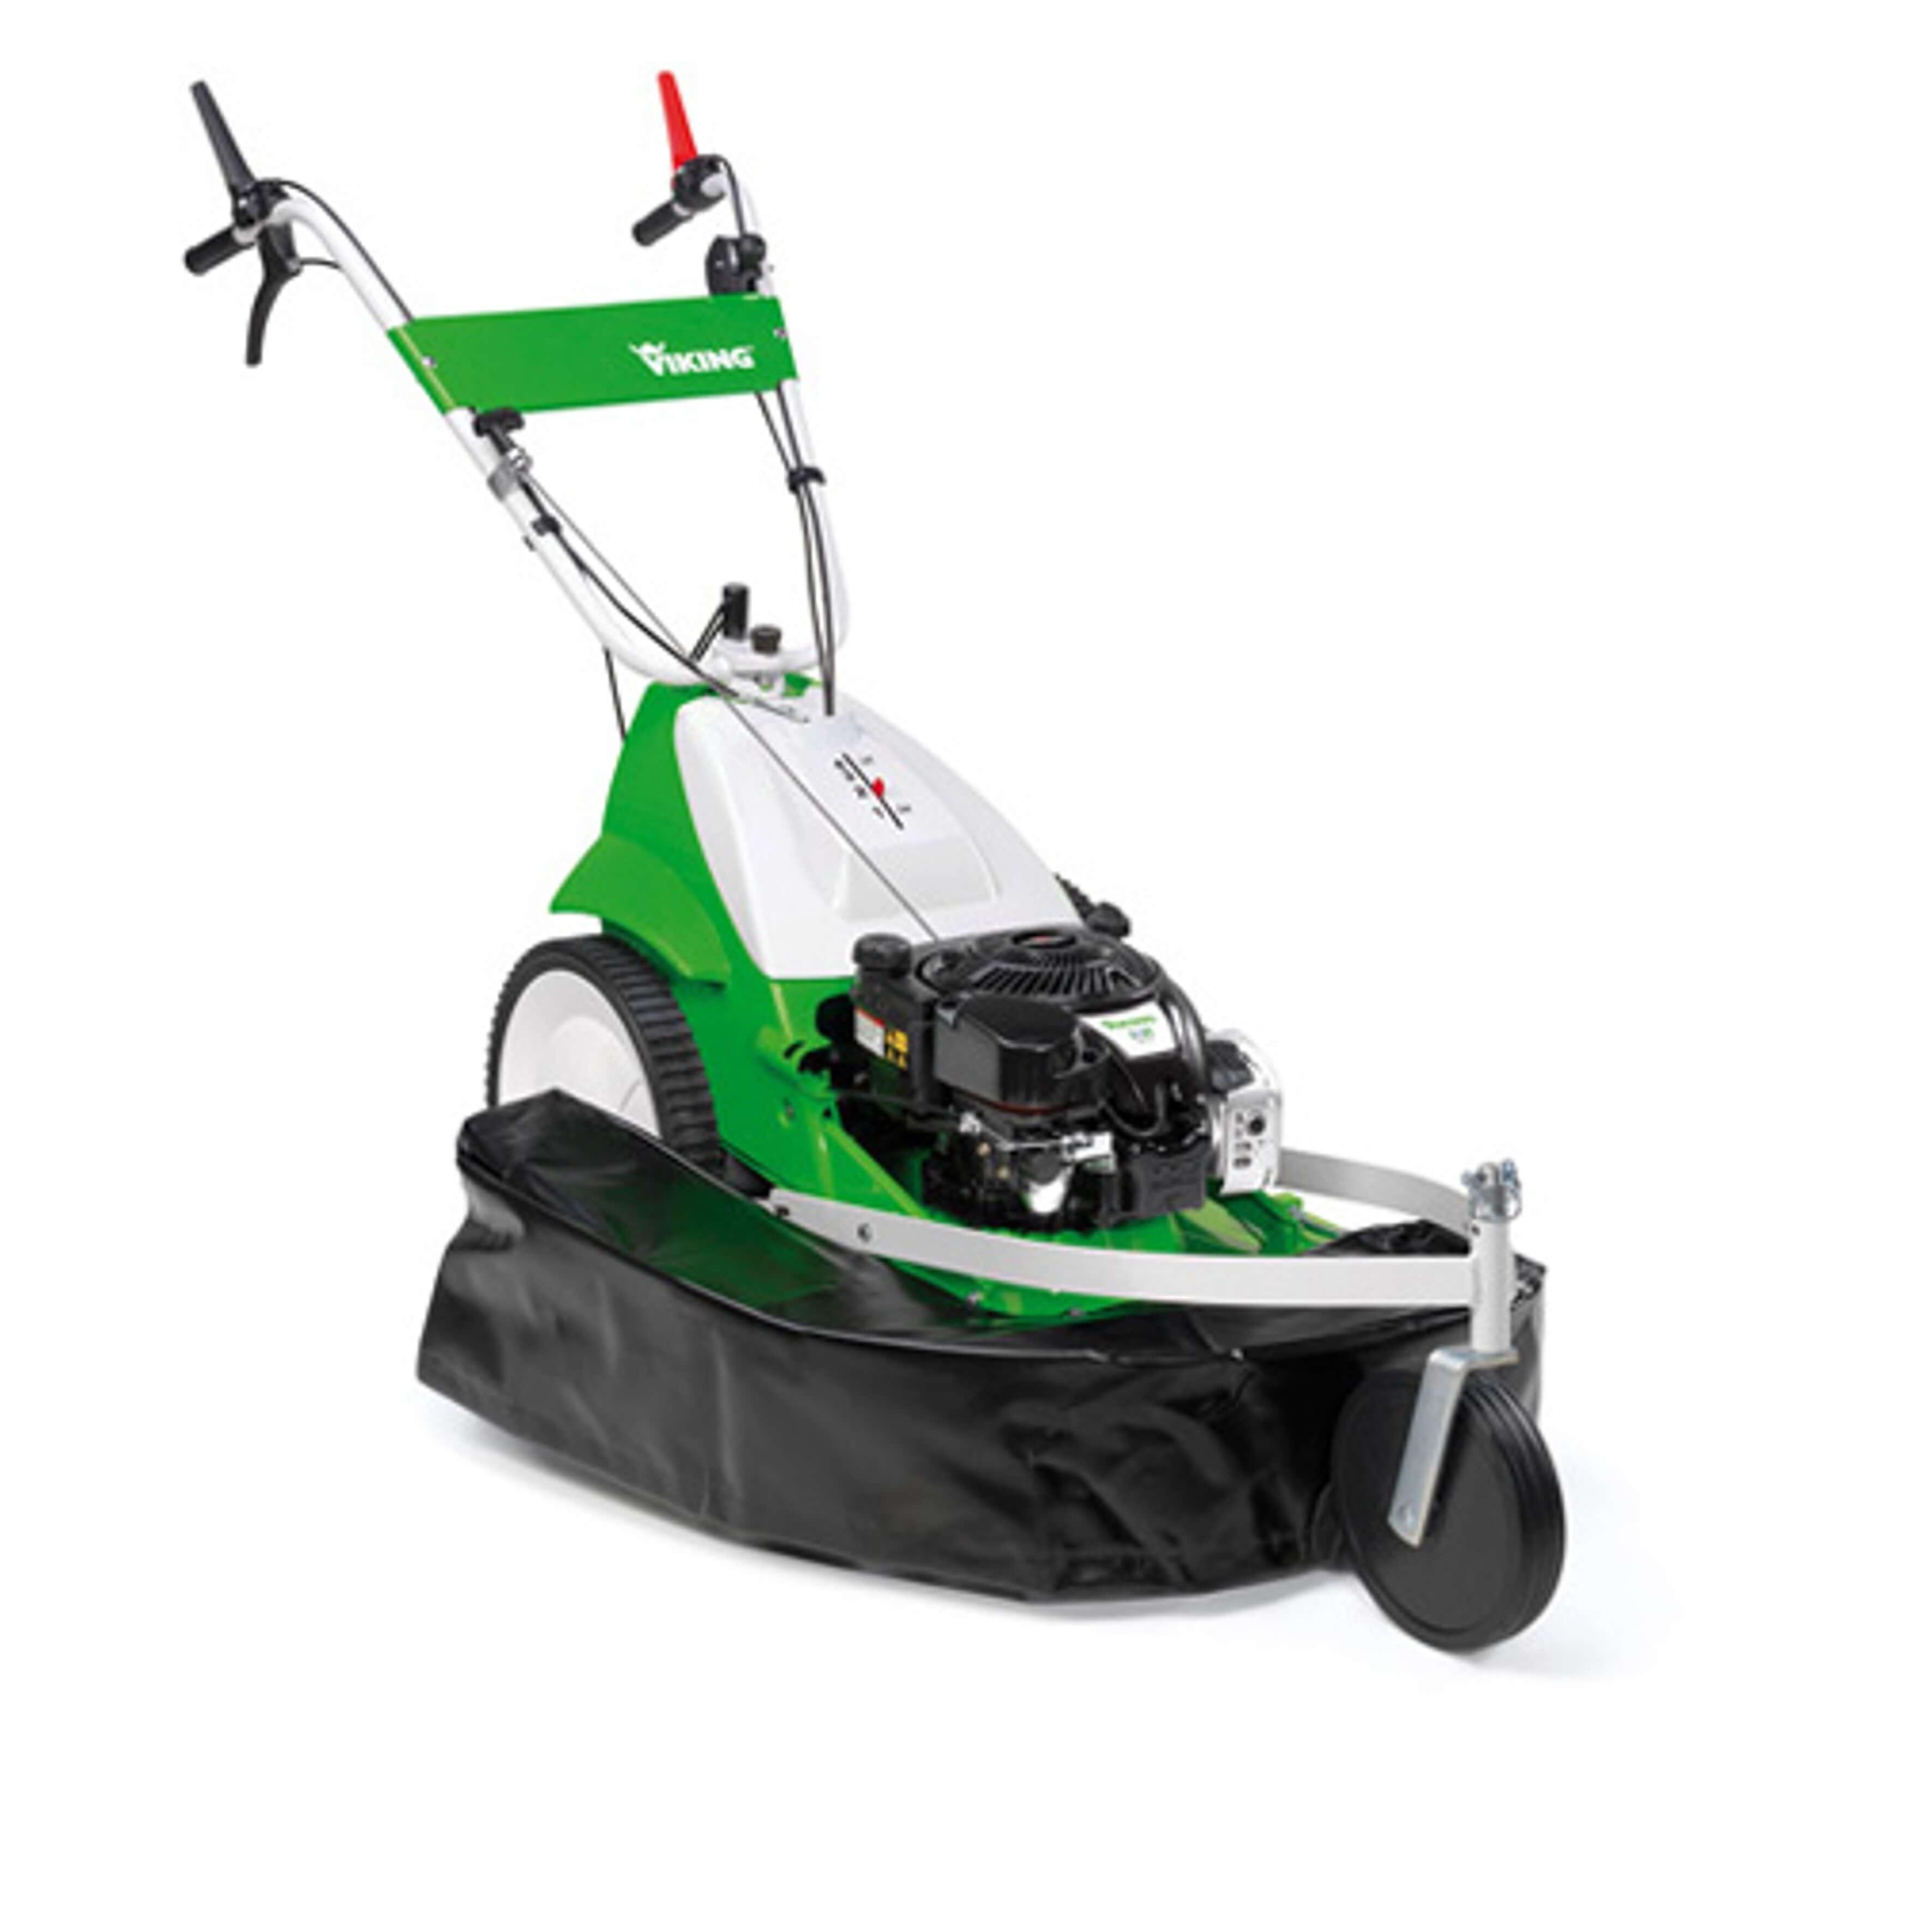 Viking MB 6.2 RH Petrol Lawn Mowers